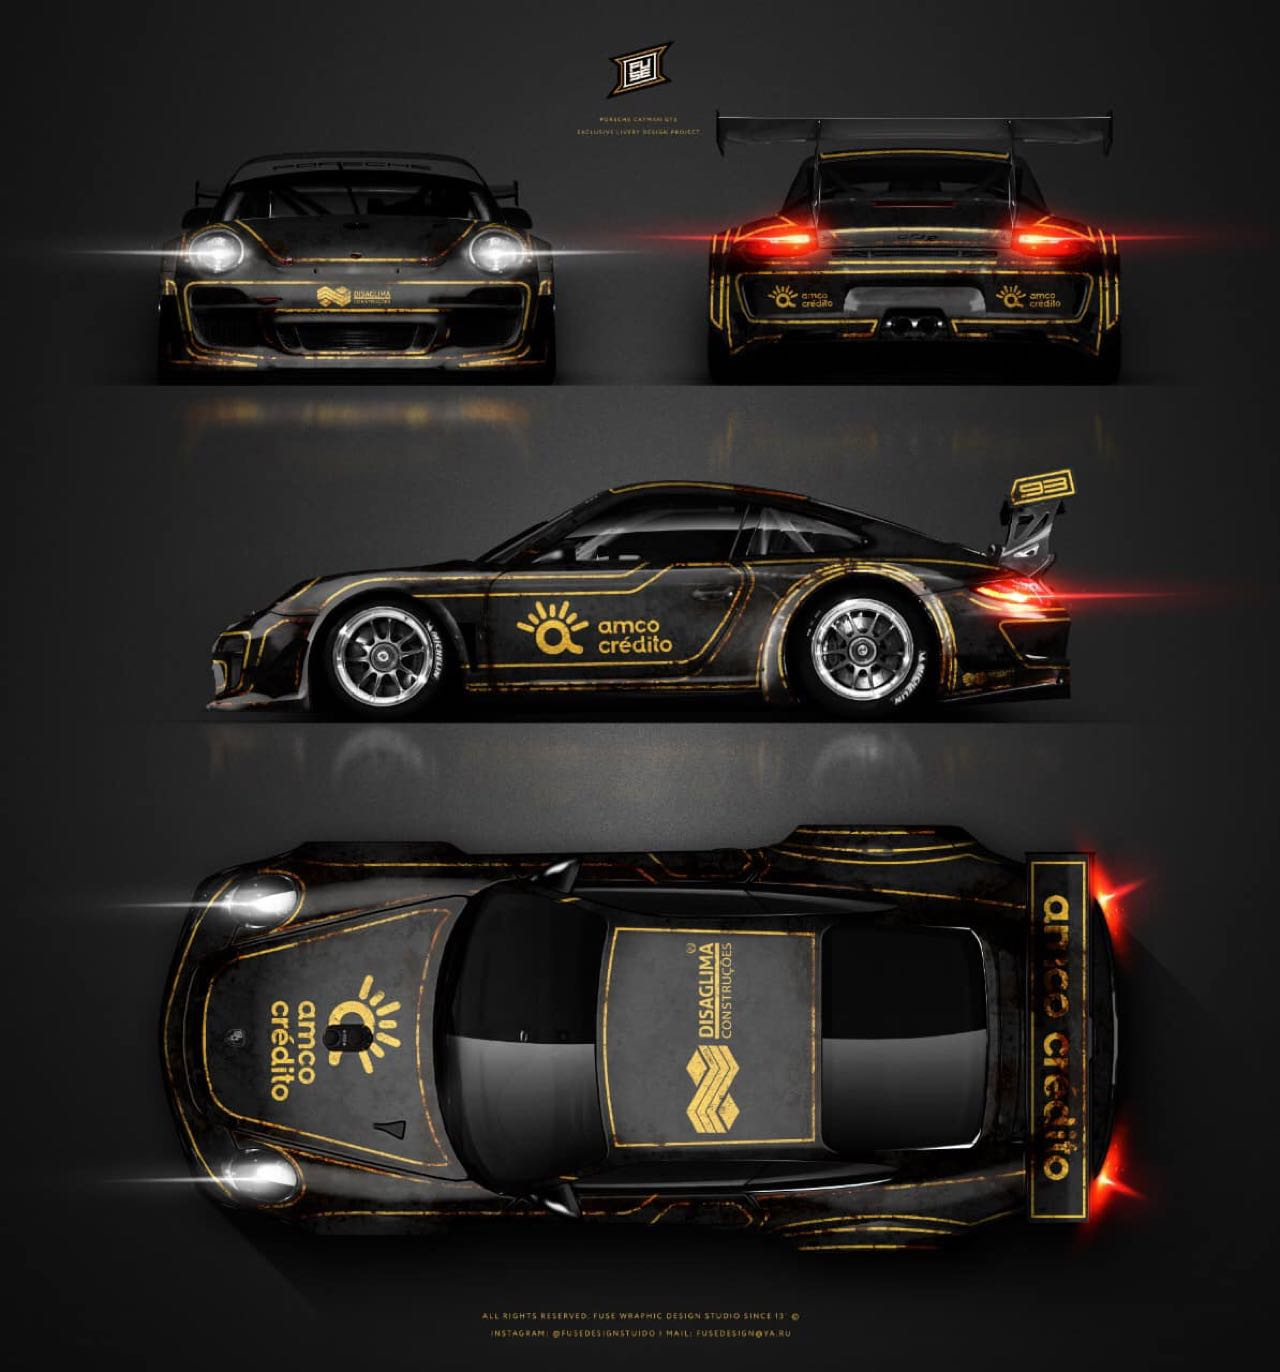 Hillclimb Monster : Porsche 911 GT3 R 4.0... C'est sérieux là ! 1